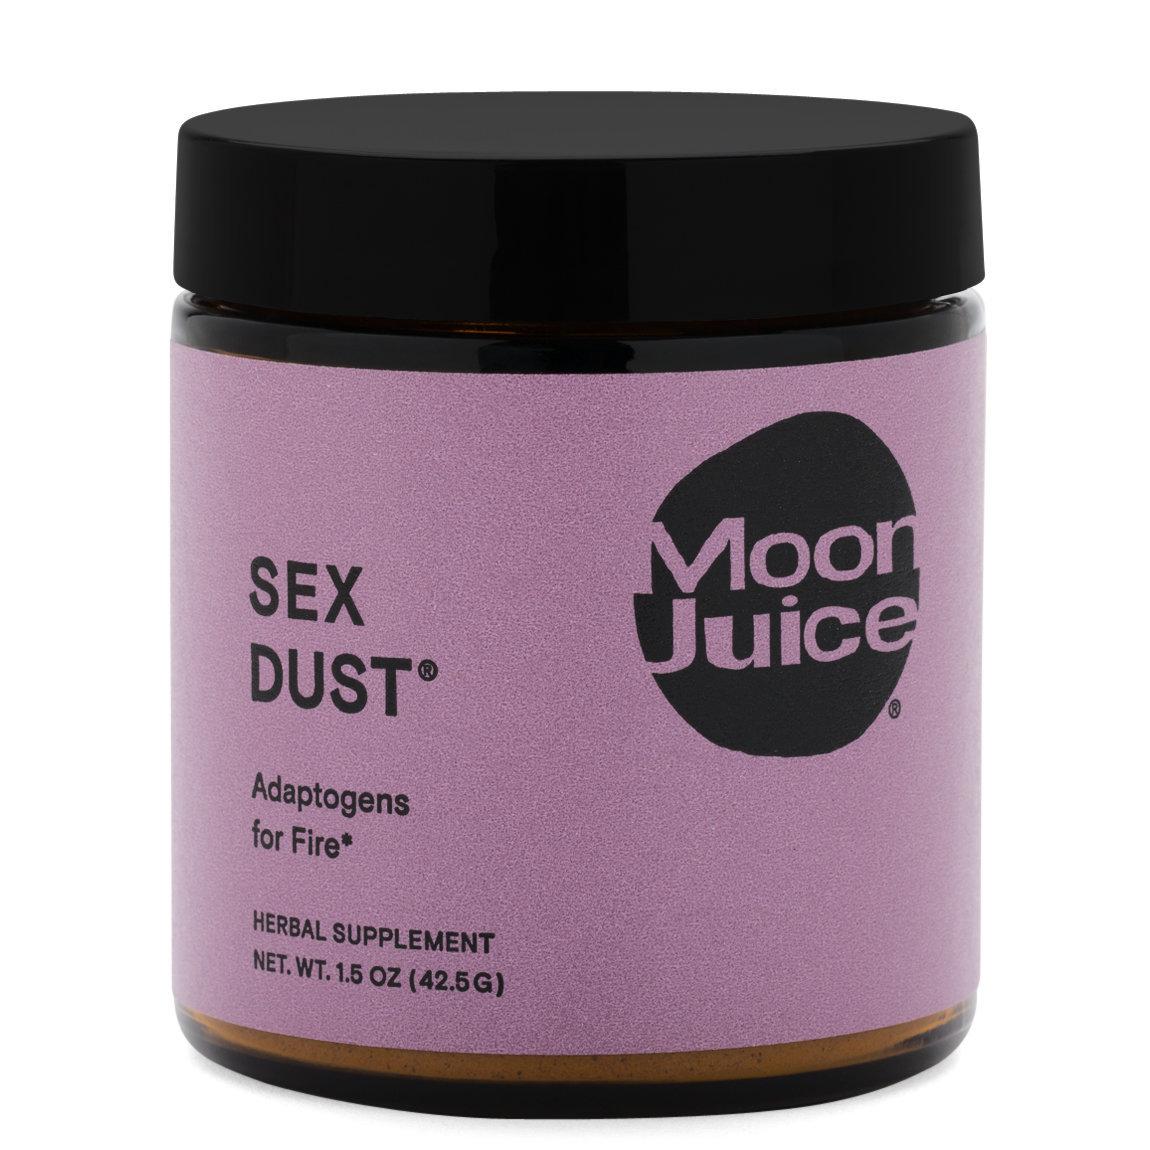 Moon Juice Sex Dust product swatch.